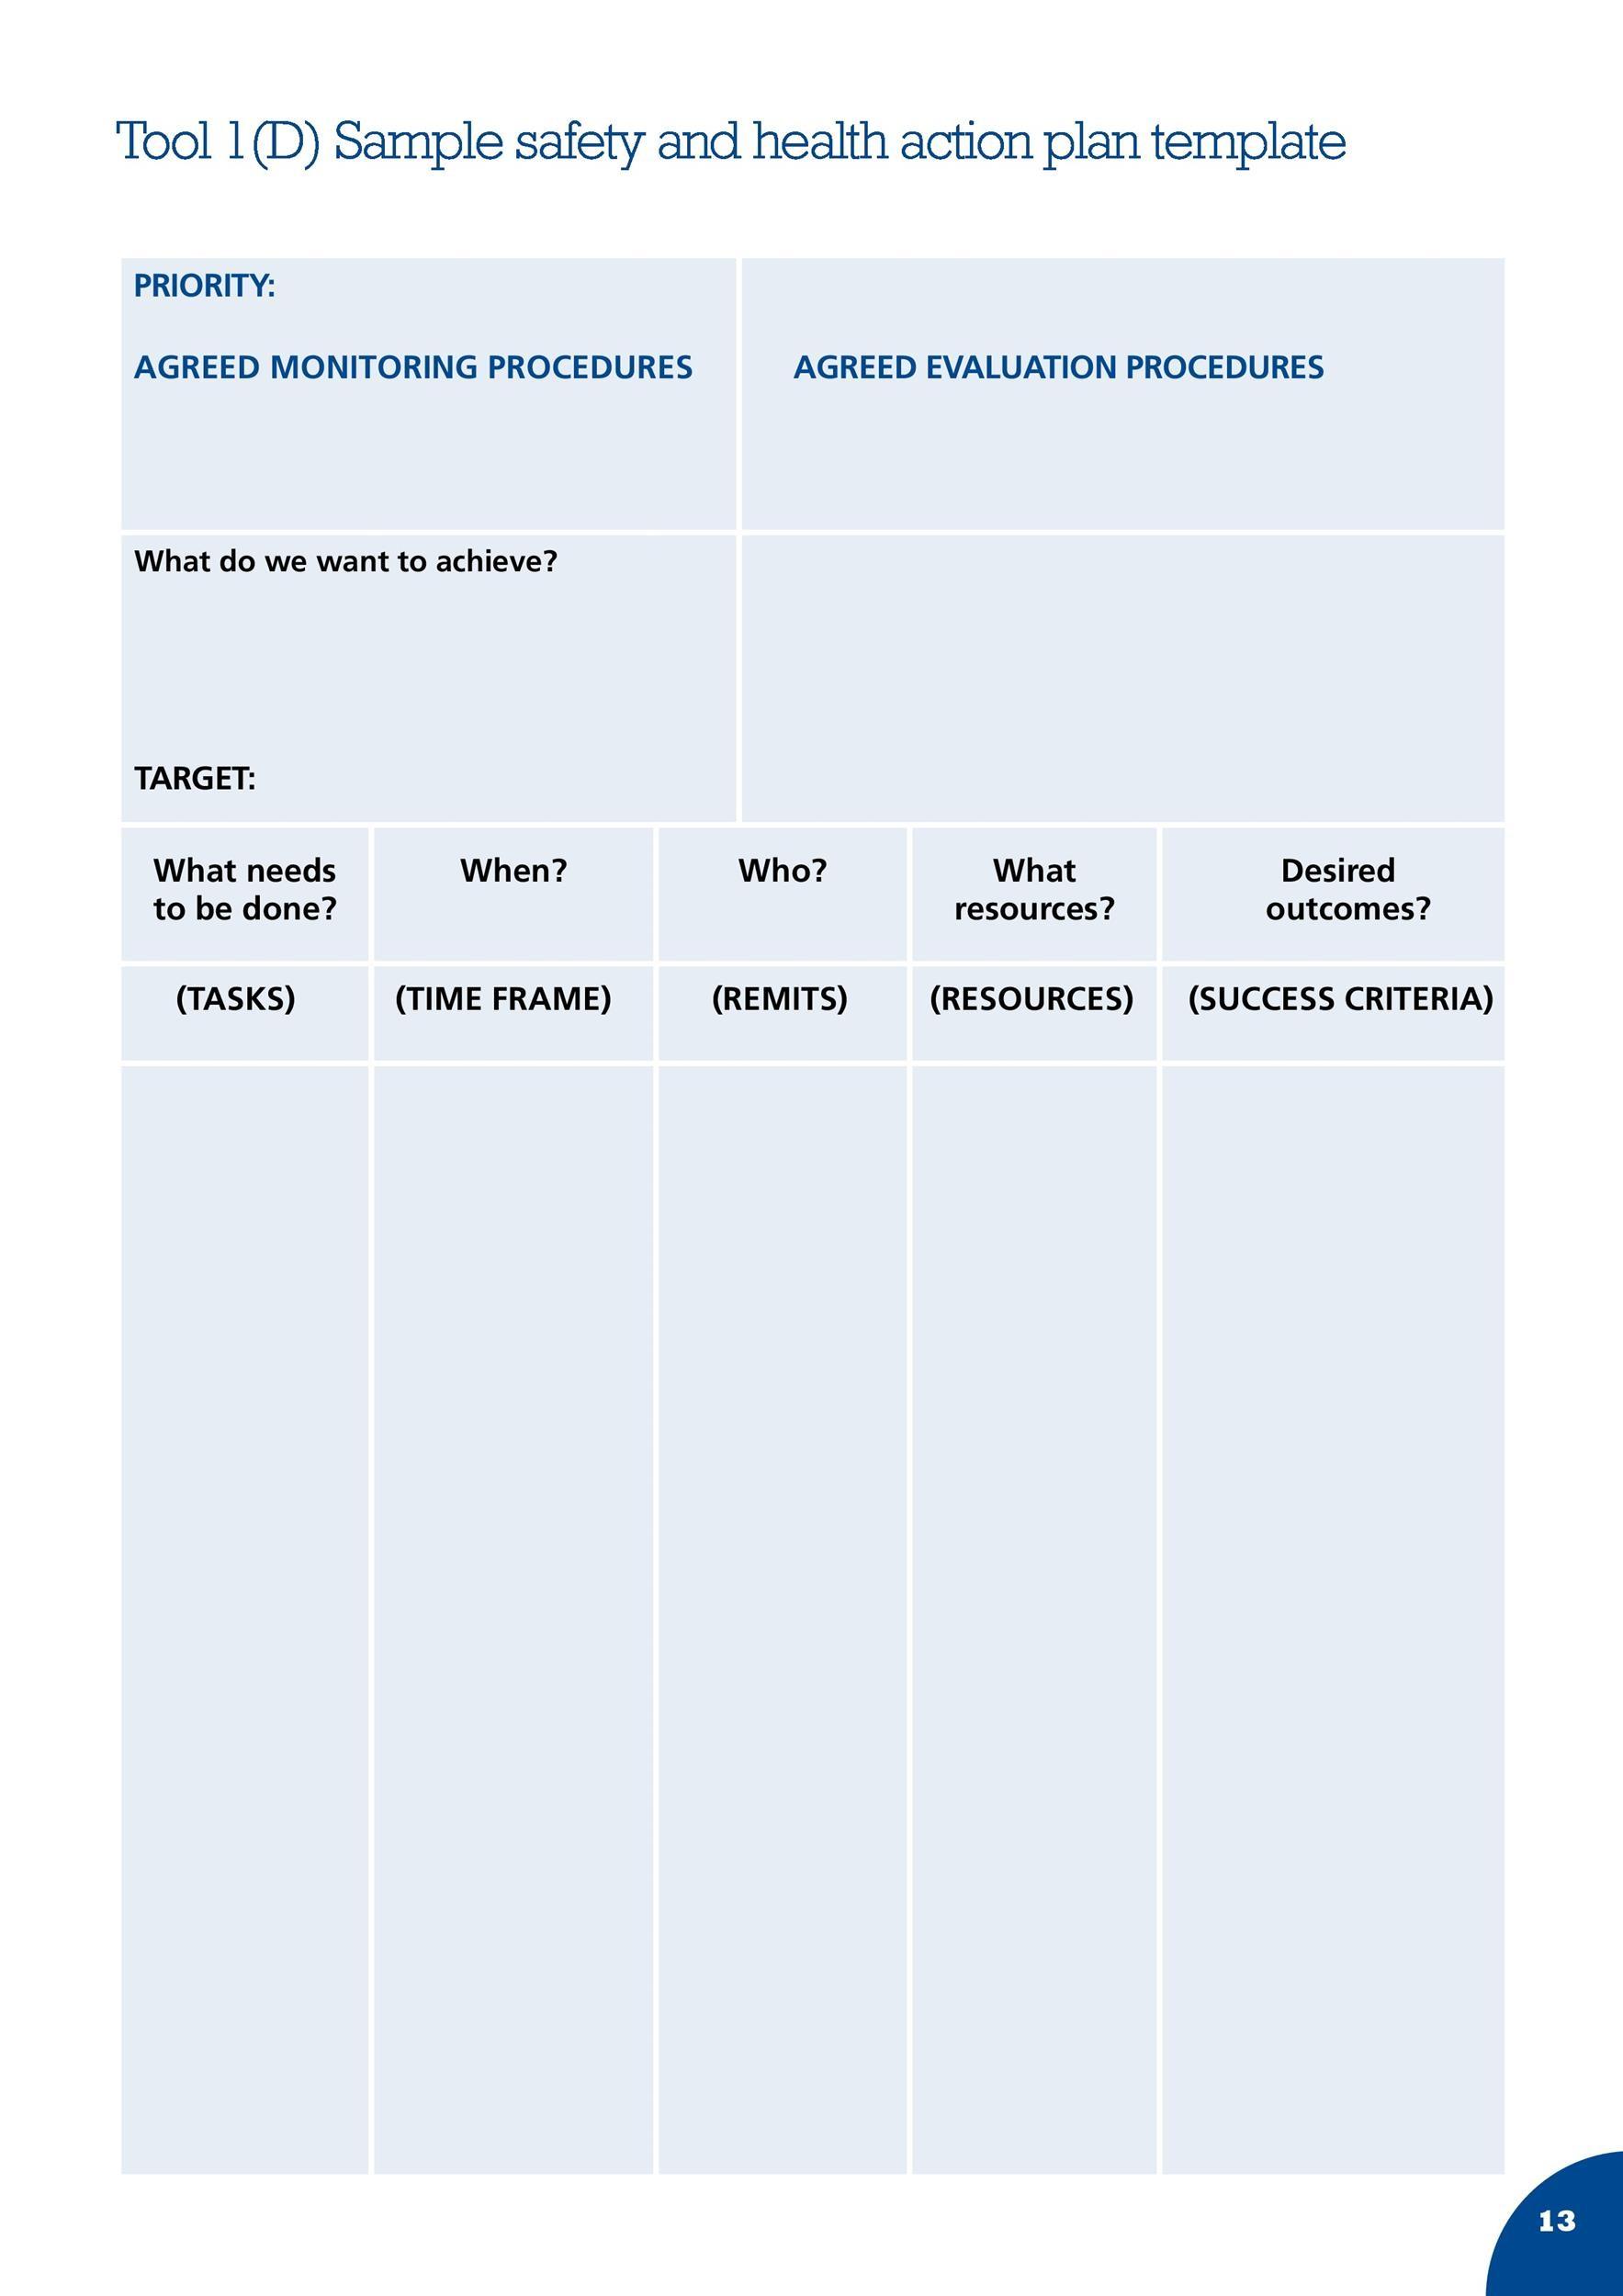 45 Free Action Plan Templates (Corrective, Emergency ...